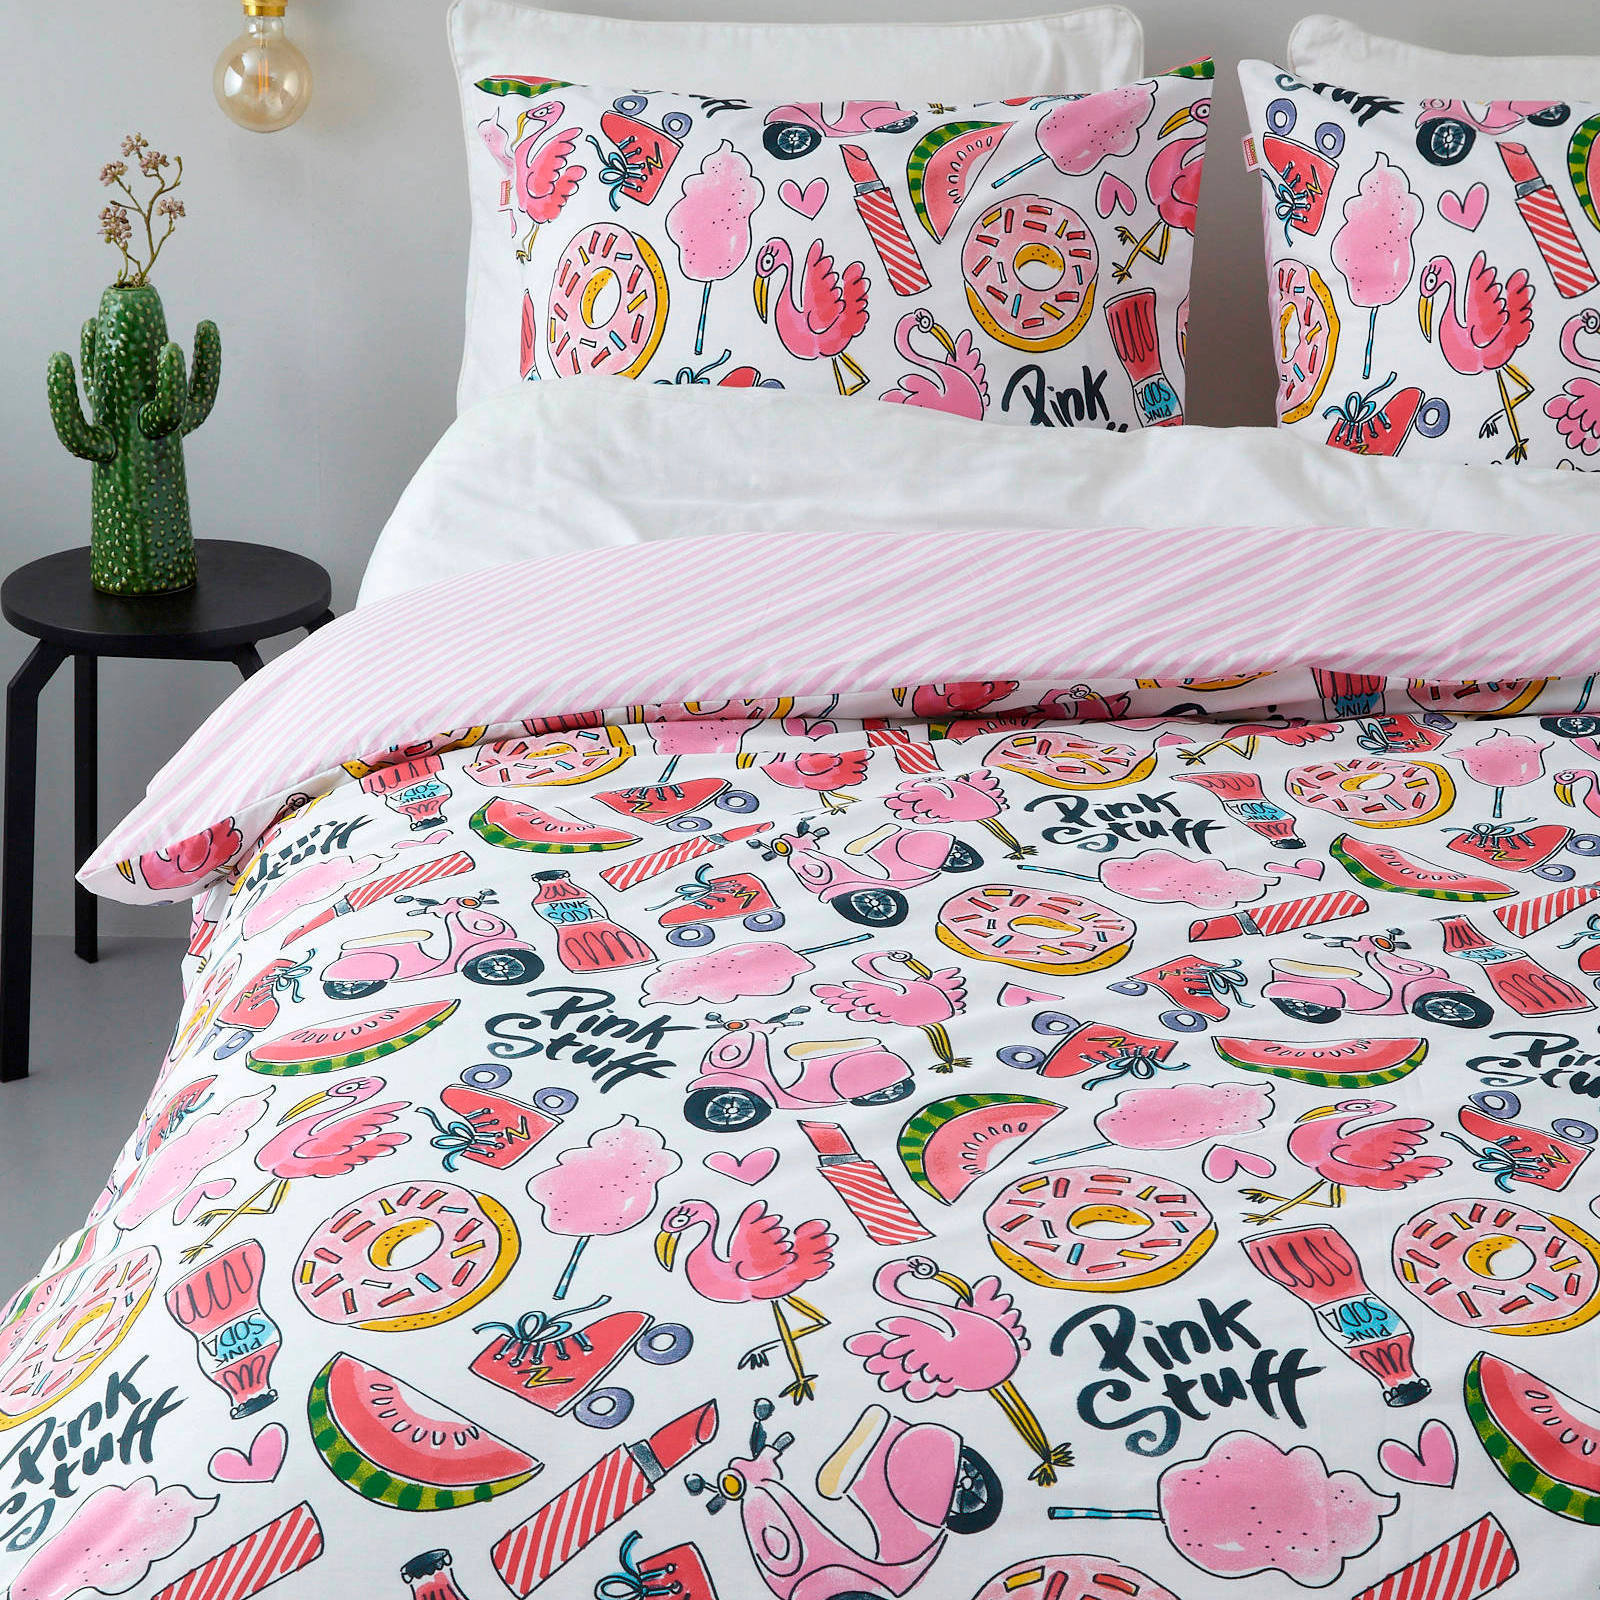 blond amsterdam katoenen dekbedovertrek lits jumeaux roze